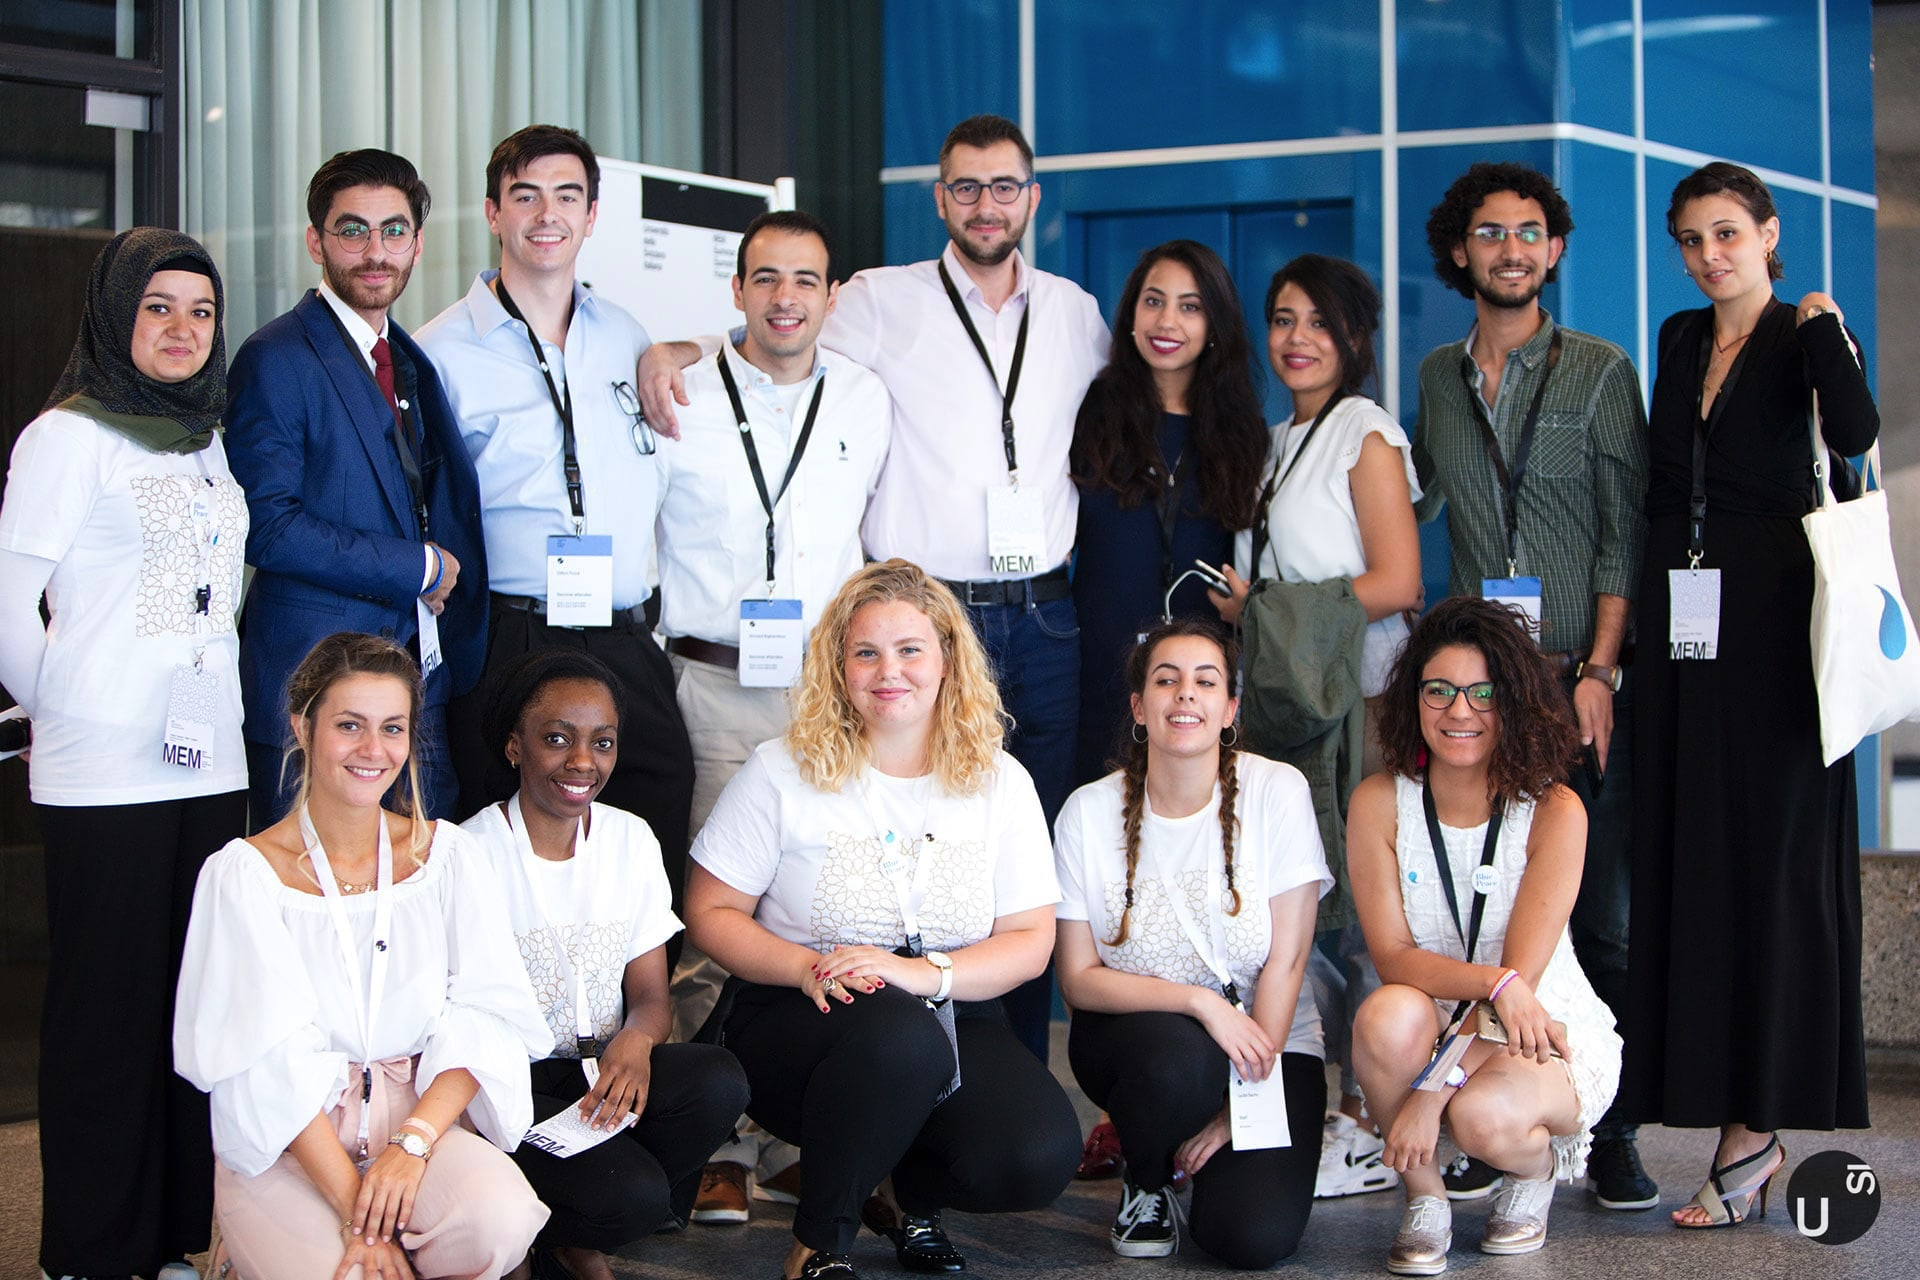 Middle East Mediterranean (MEM) Summer Summit 2020 in Lugano, Switzerland (Funding available)